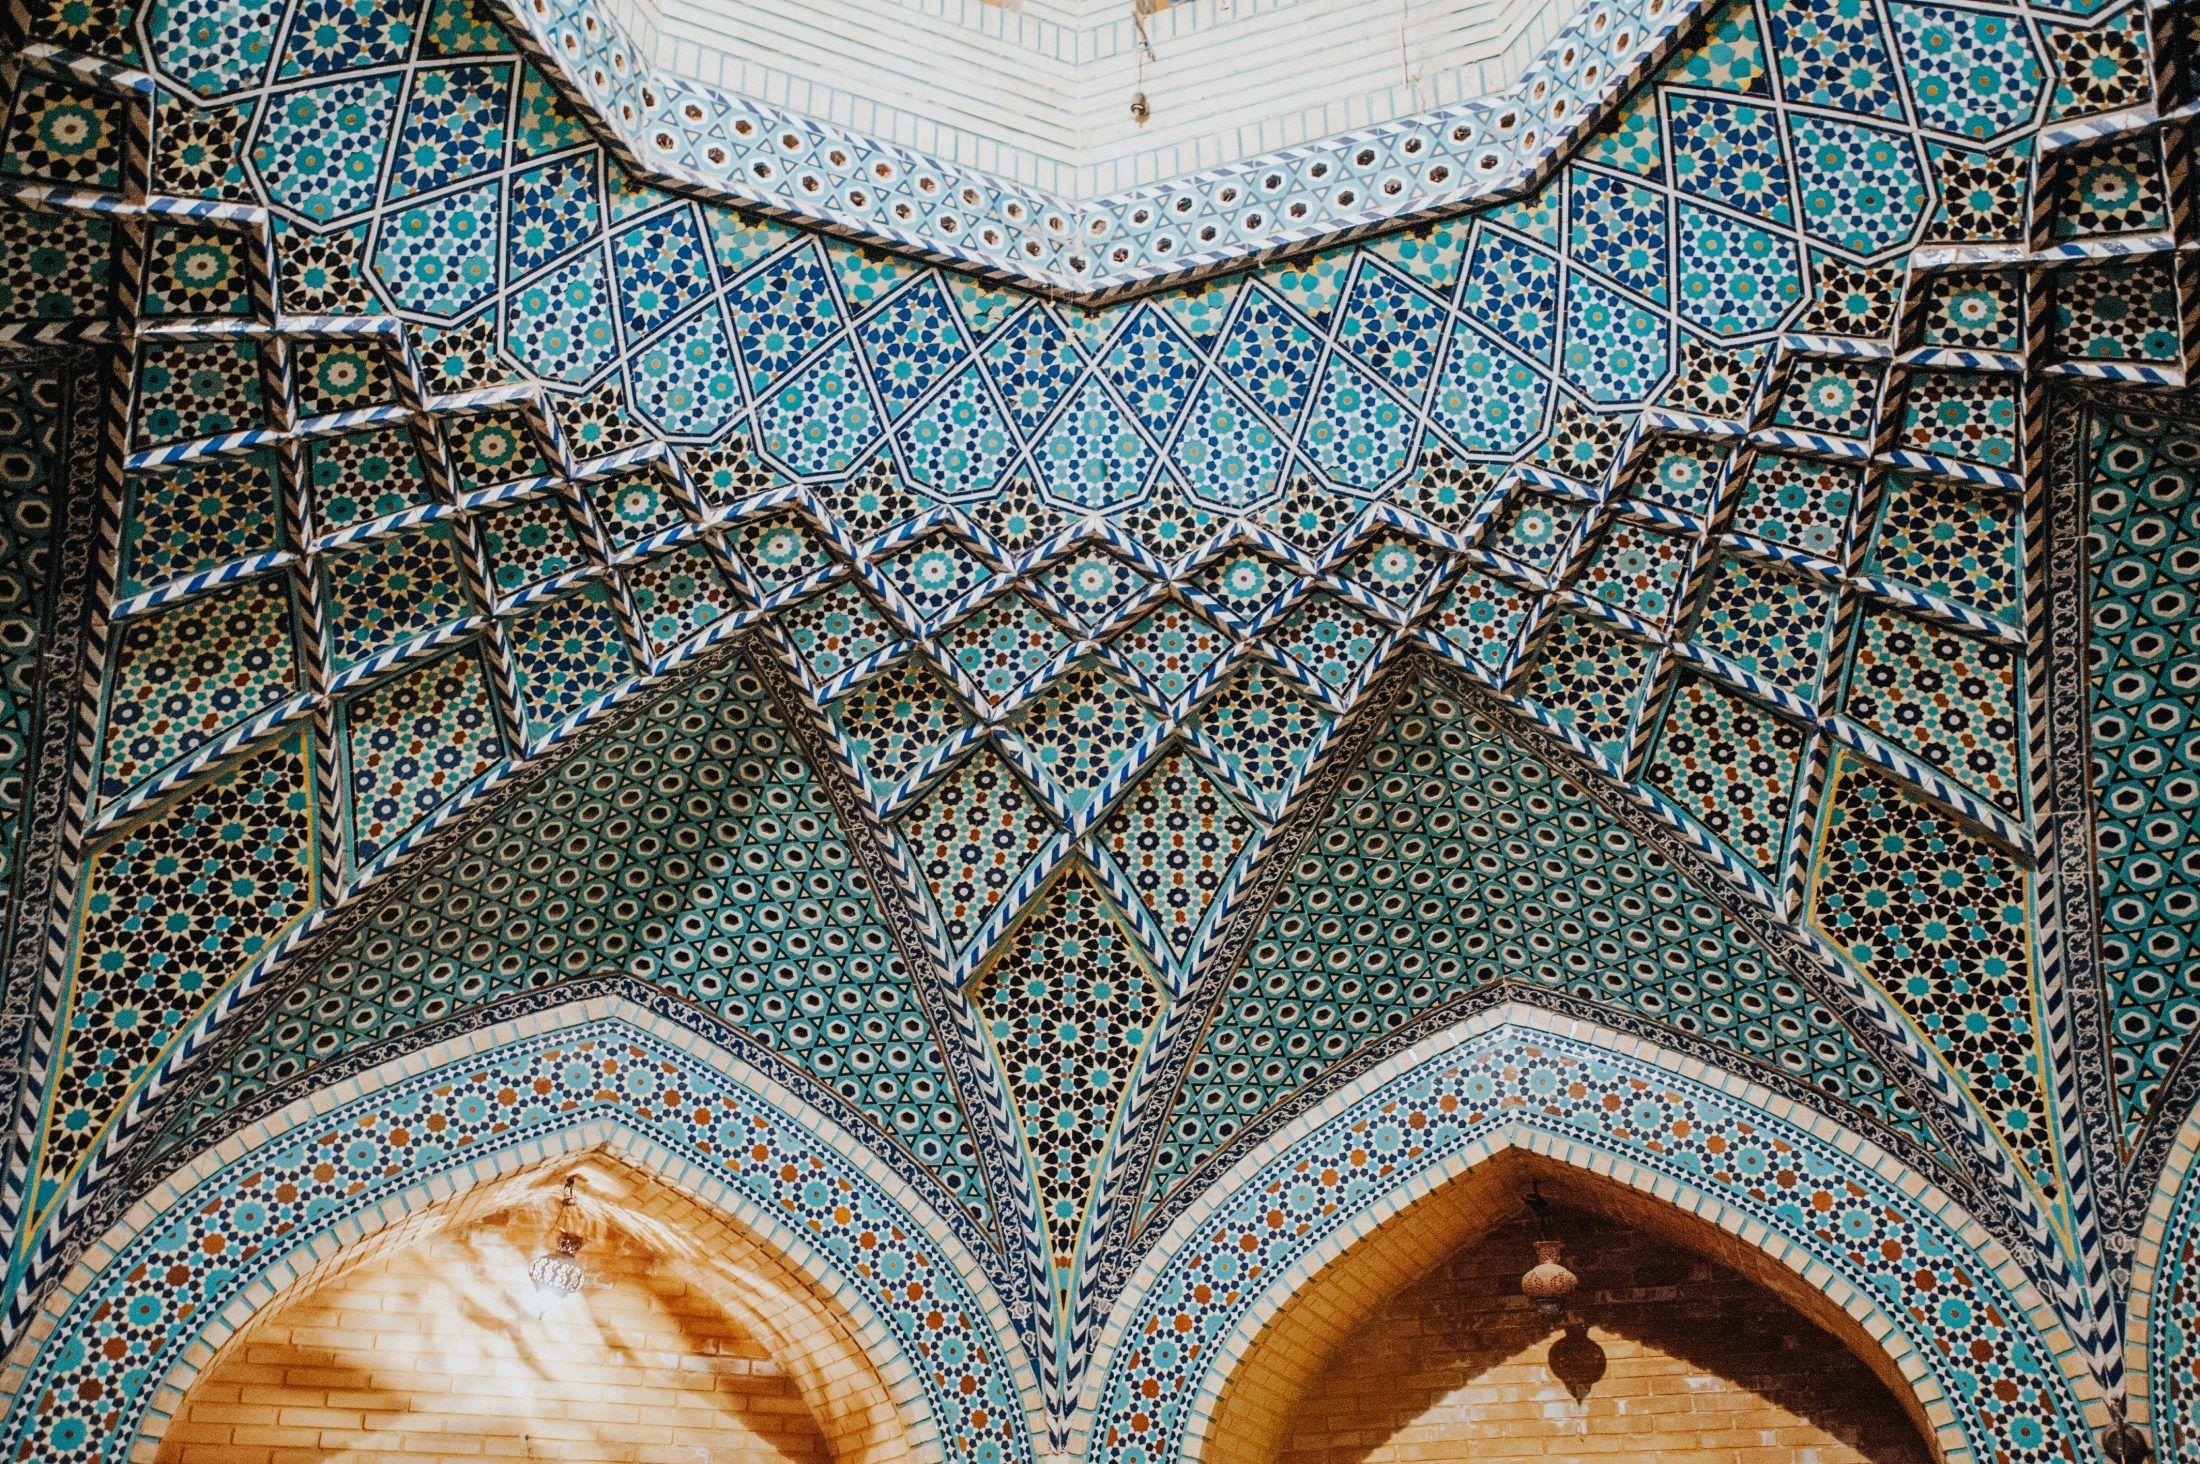 مقبره آرامگاه سعدی شیراز